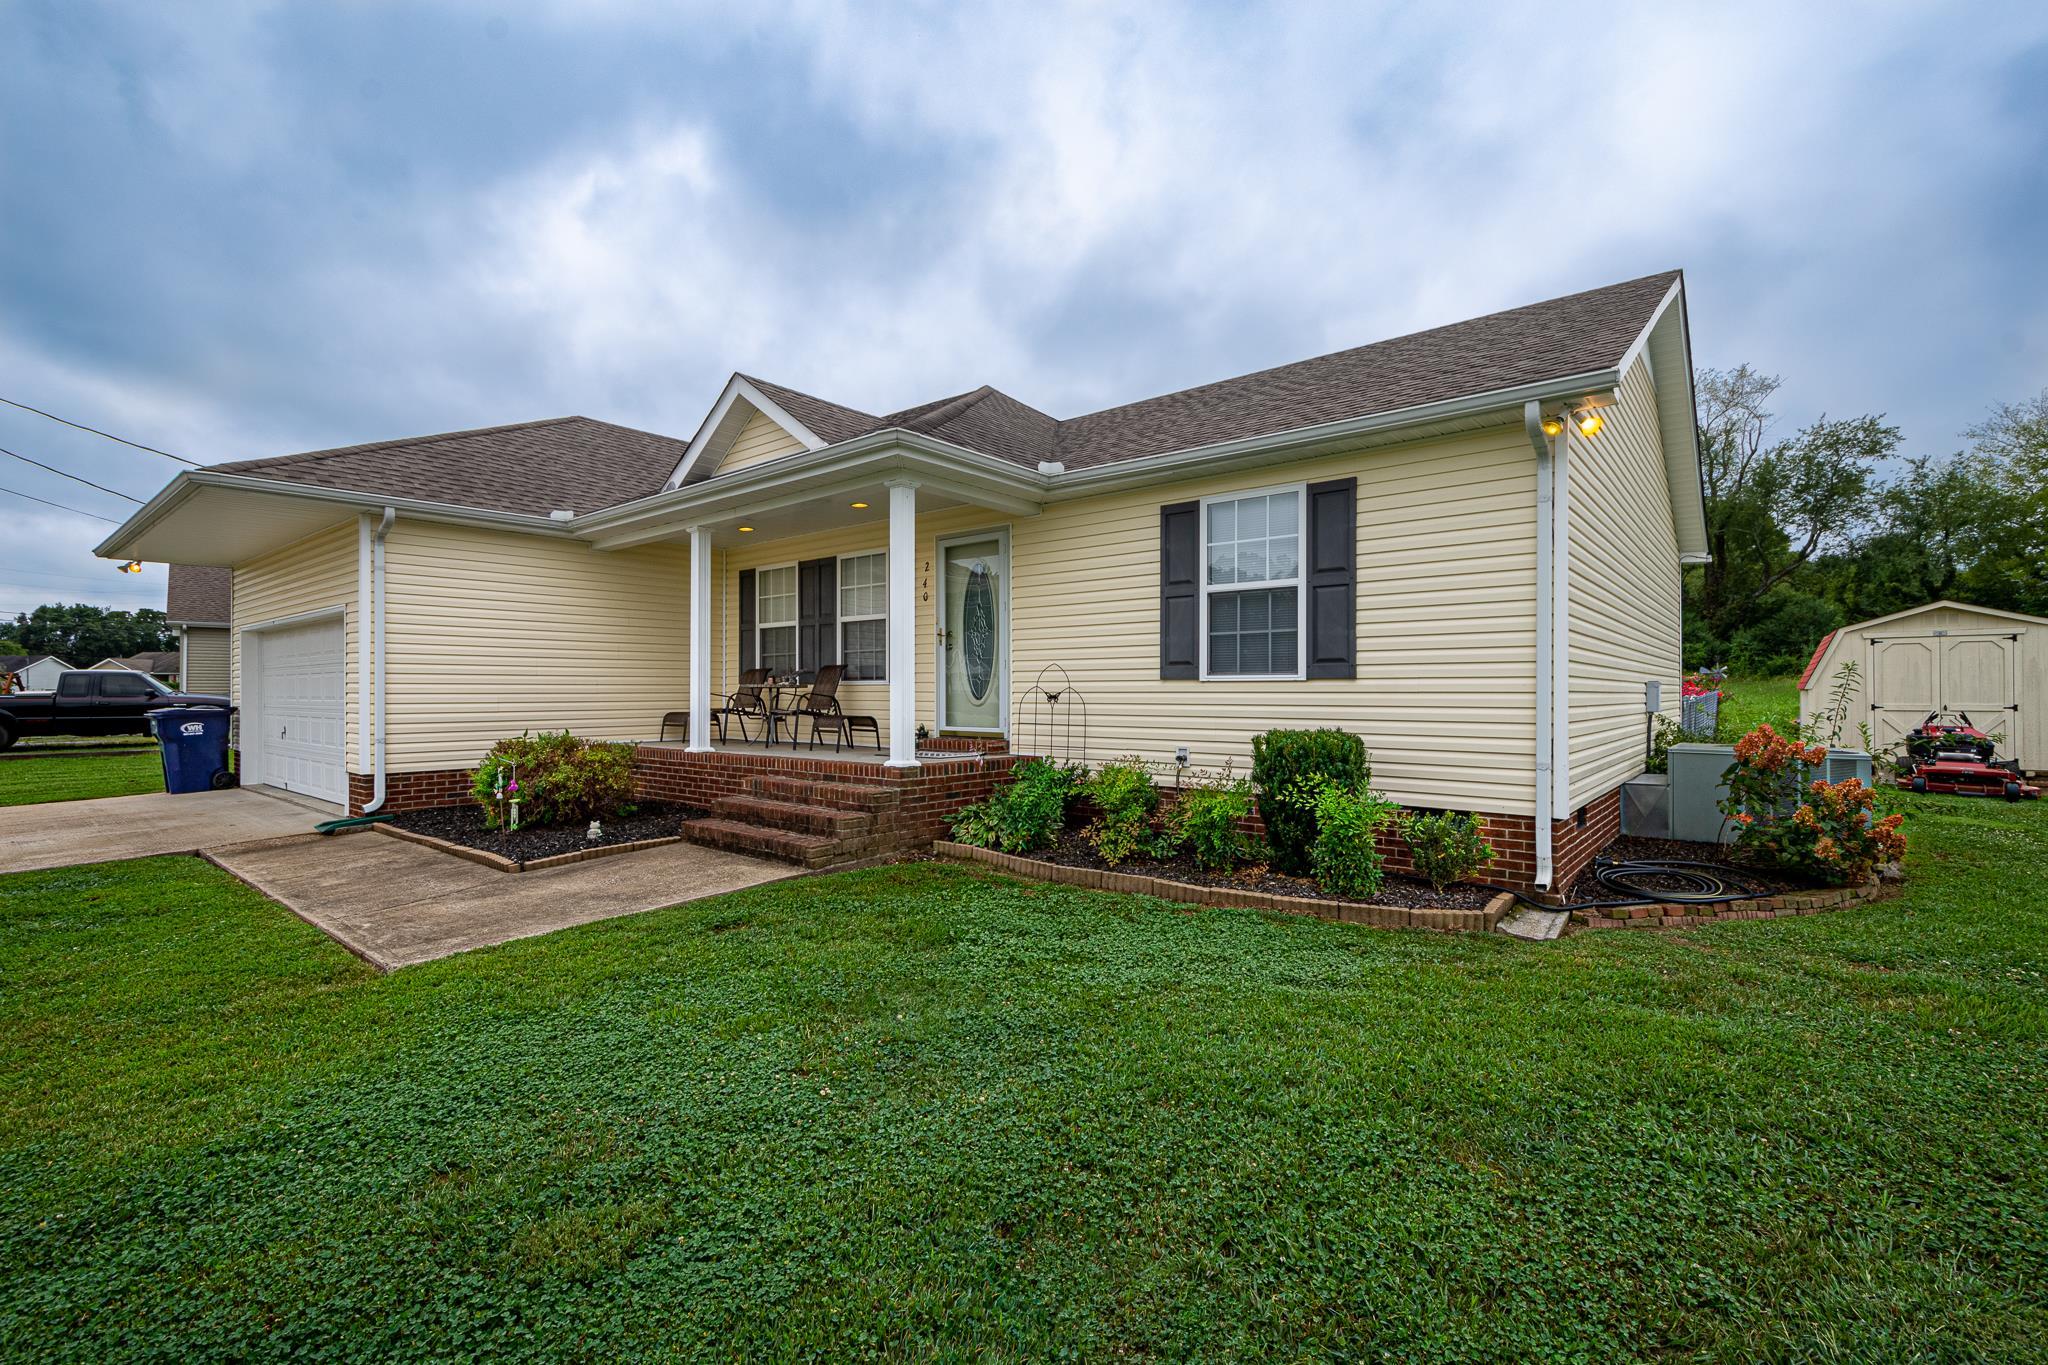 240 Daytona Dr, Cornersville, TN 37047 - Cornersville, TN real estate listing